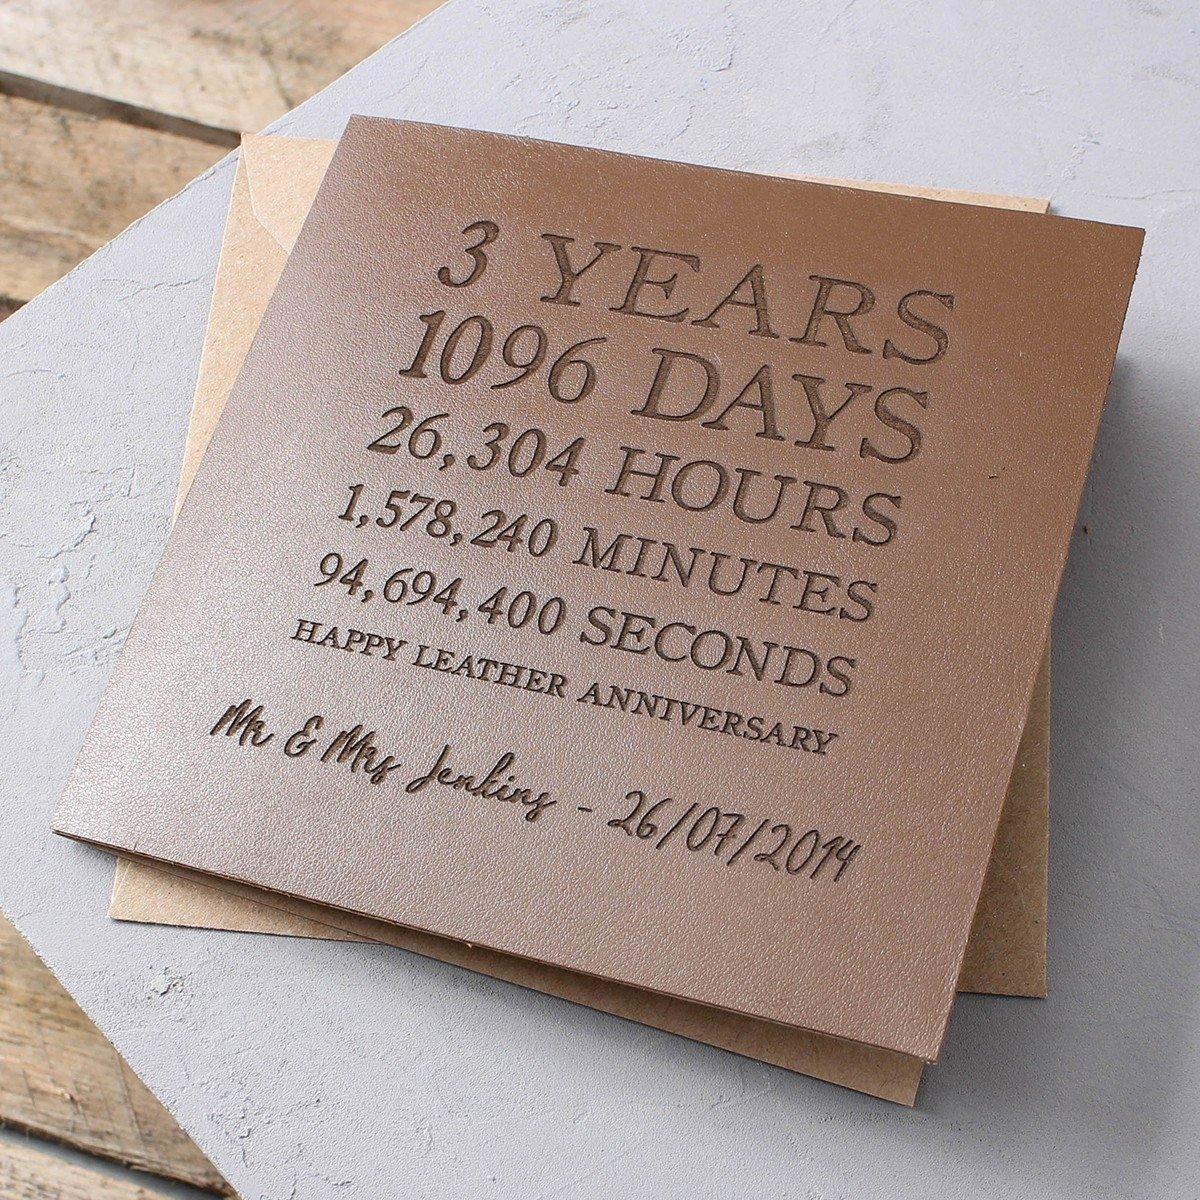 10 Stunning 3 Year Anniversary Gift Ideas